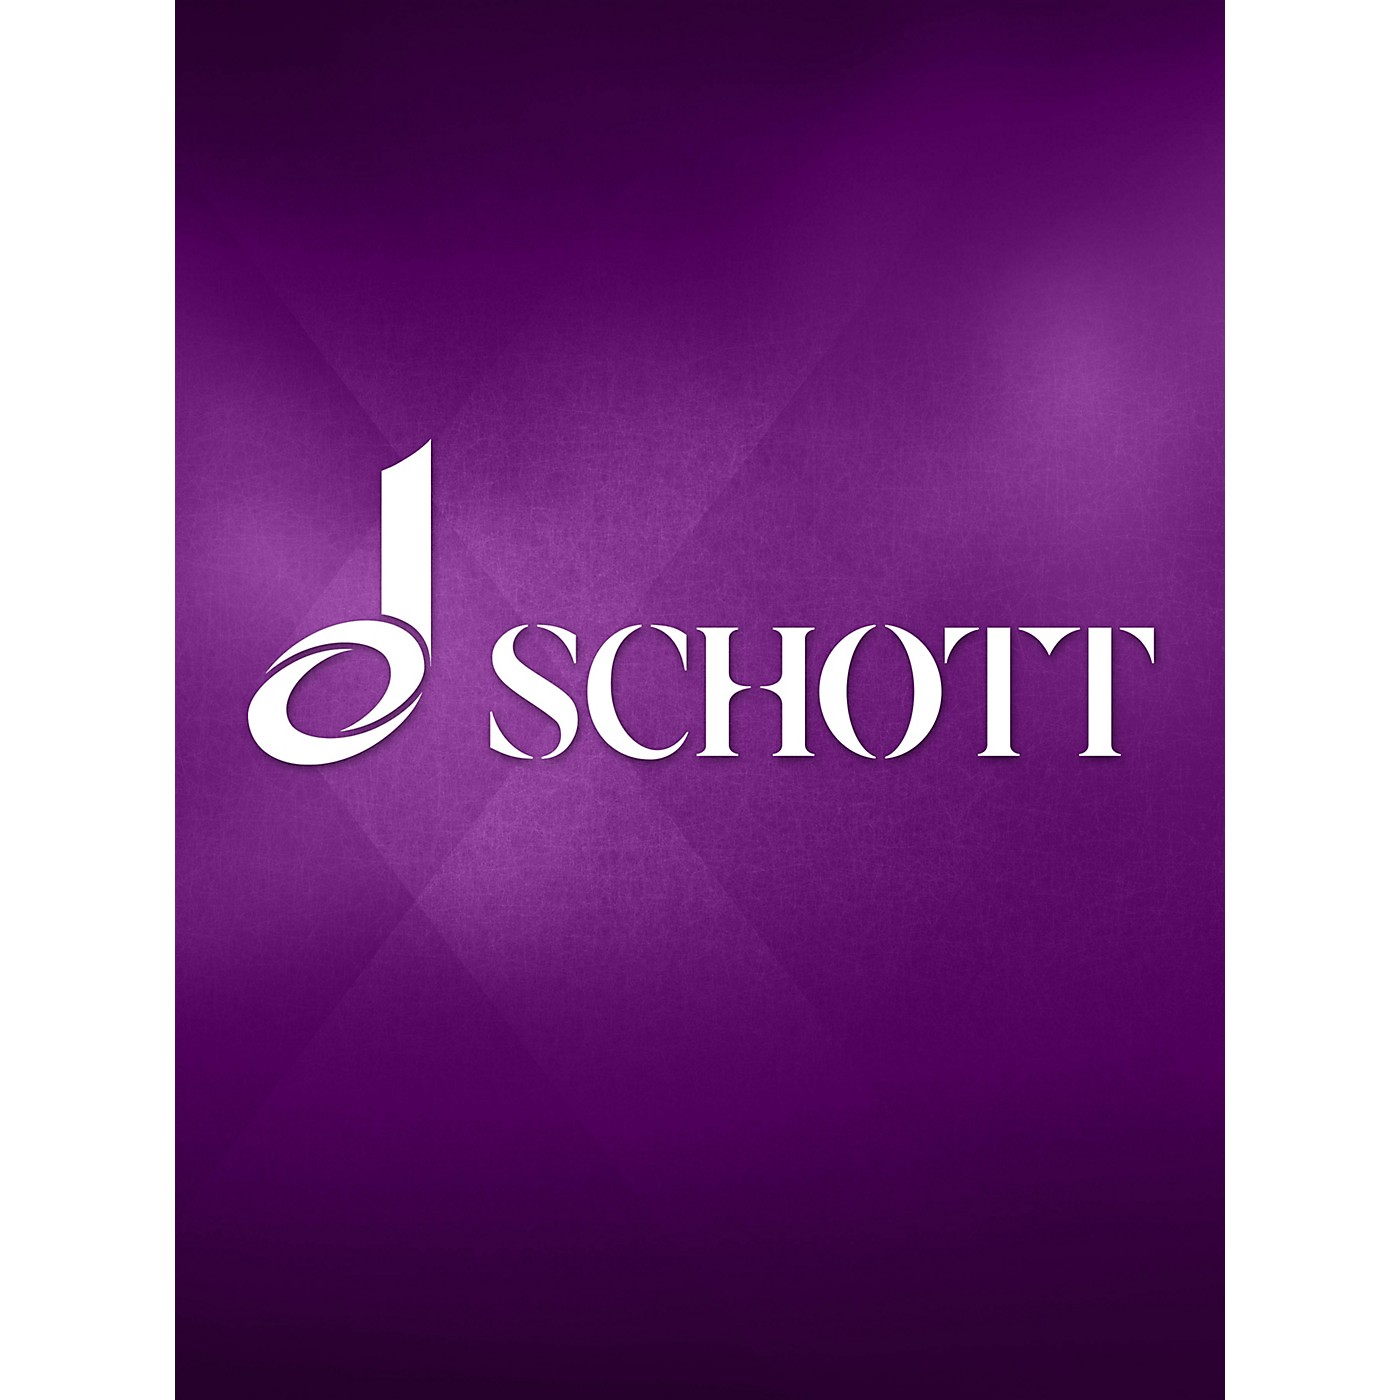 Schott Wee Willie Winkie and 7 Other Songs Schott Series thumbnail